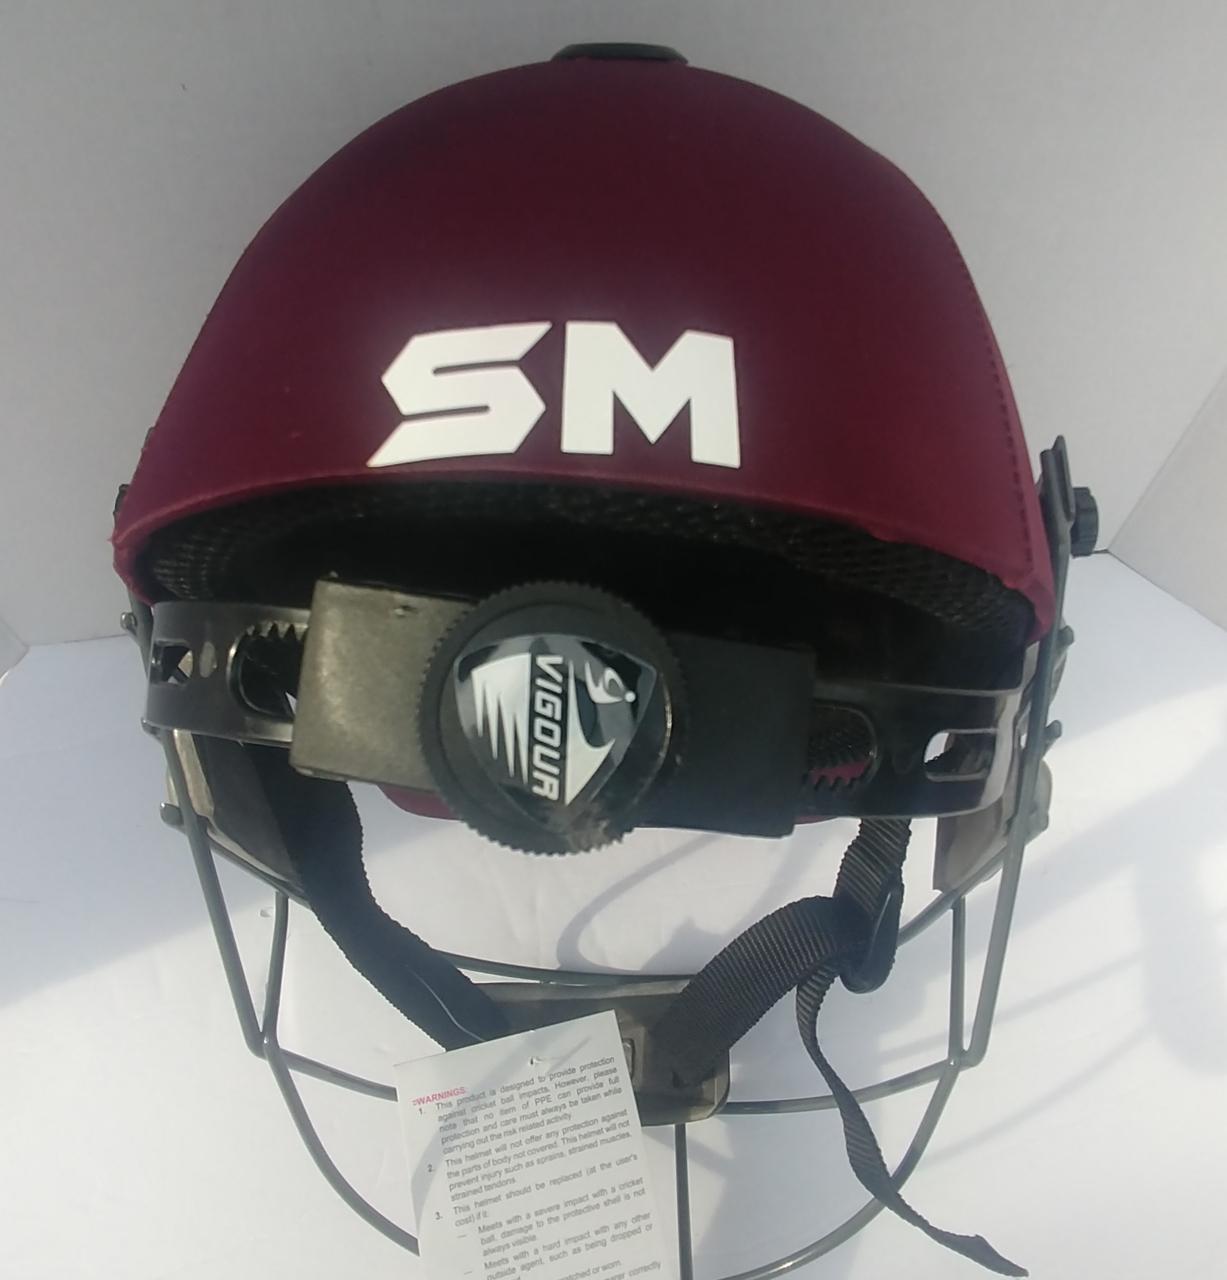 Picture of SM Cricket Helmet VIGOUR - Maroon